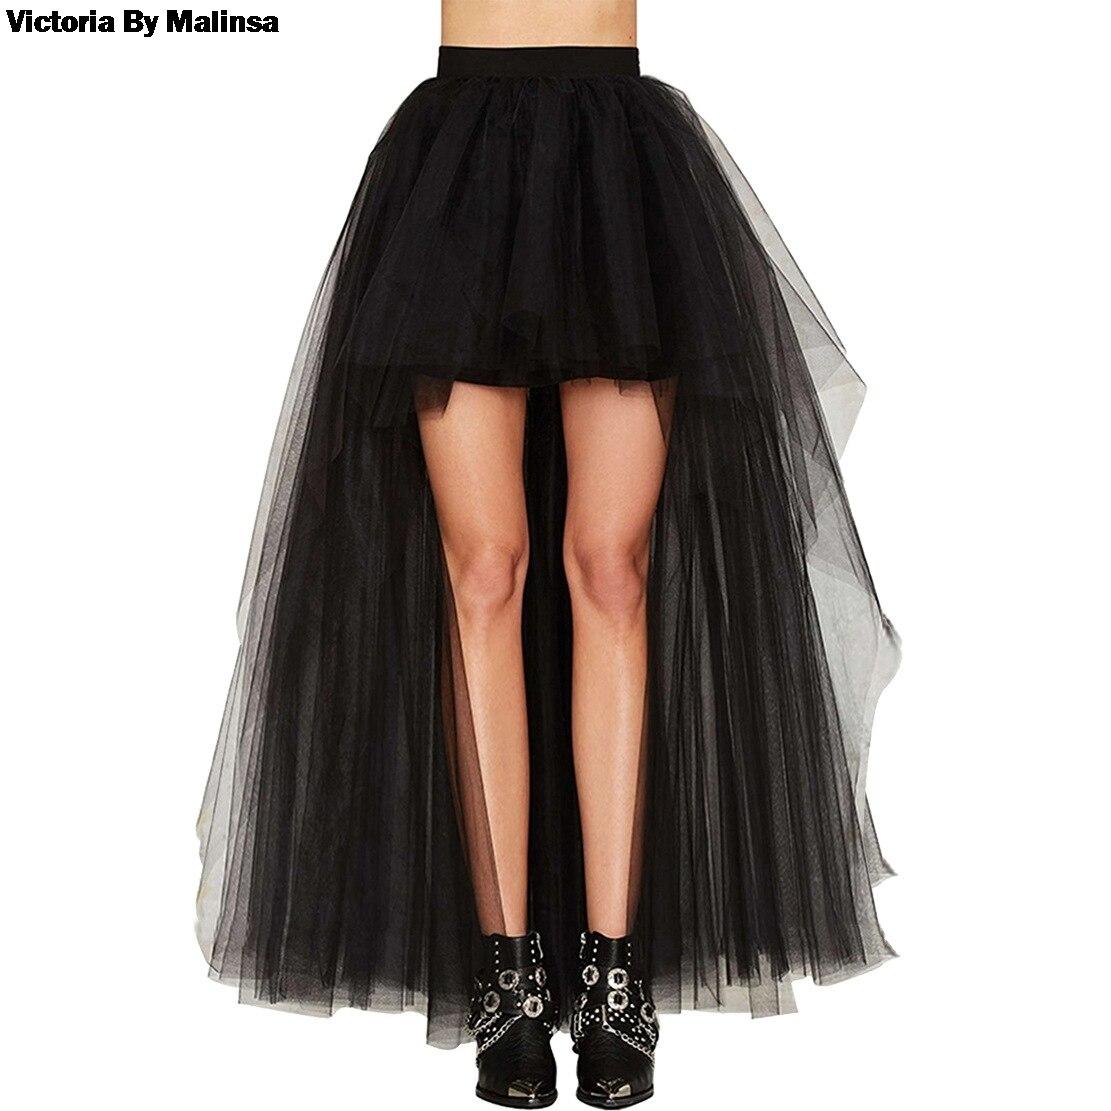 Women's Tulle Tutu Long Black Skirts Sexy Asymmetry Vintage Steampunk Skirts Women Long Burlesque Corset Skirt Black Plus Size